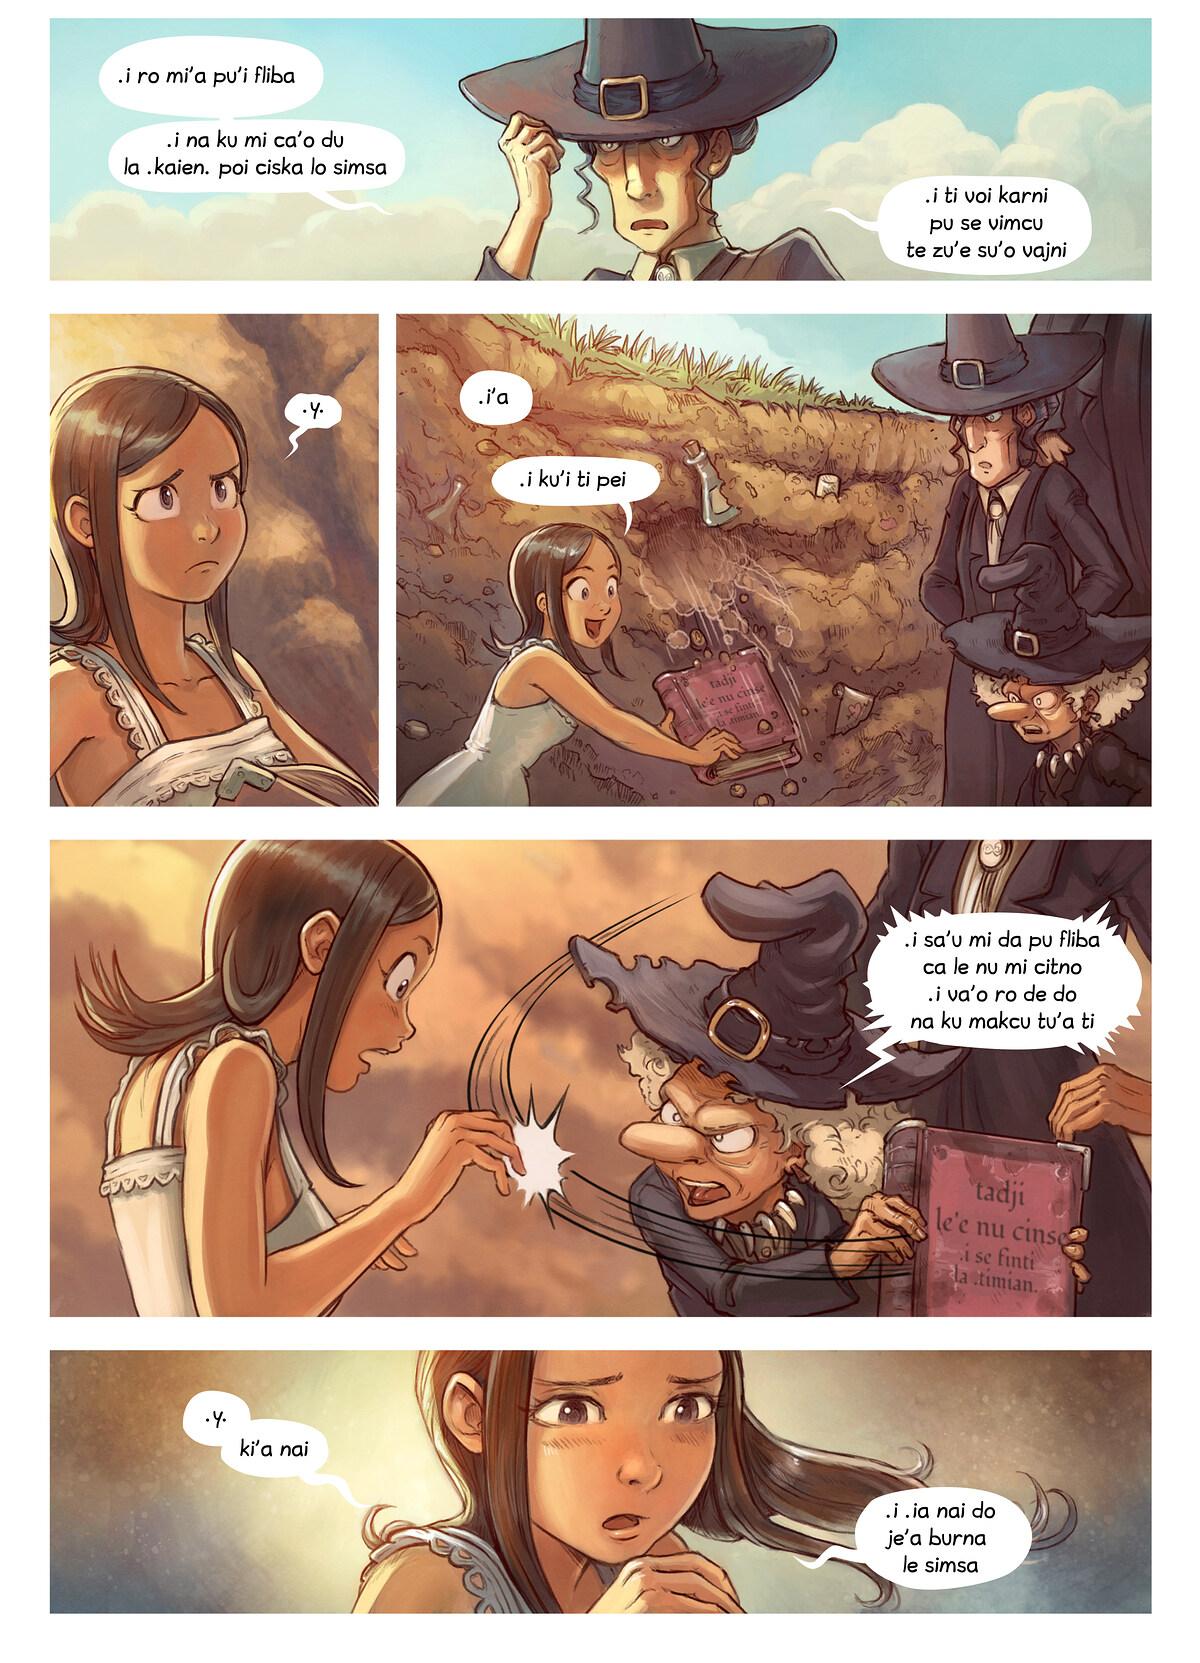 A webcomic page of Pepper&Carrot, pagbu 19 [jb], papri 5